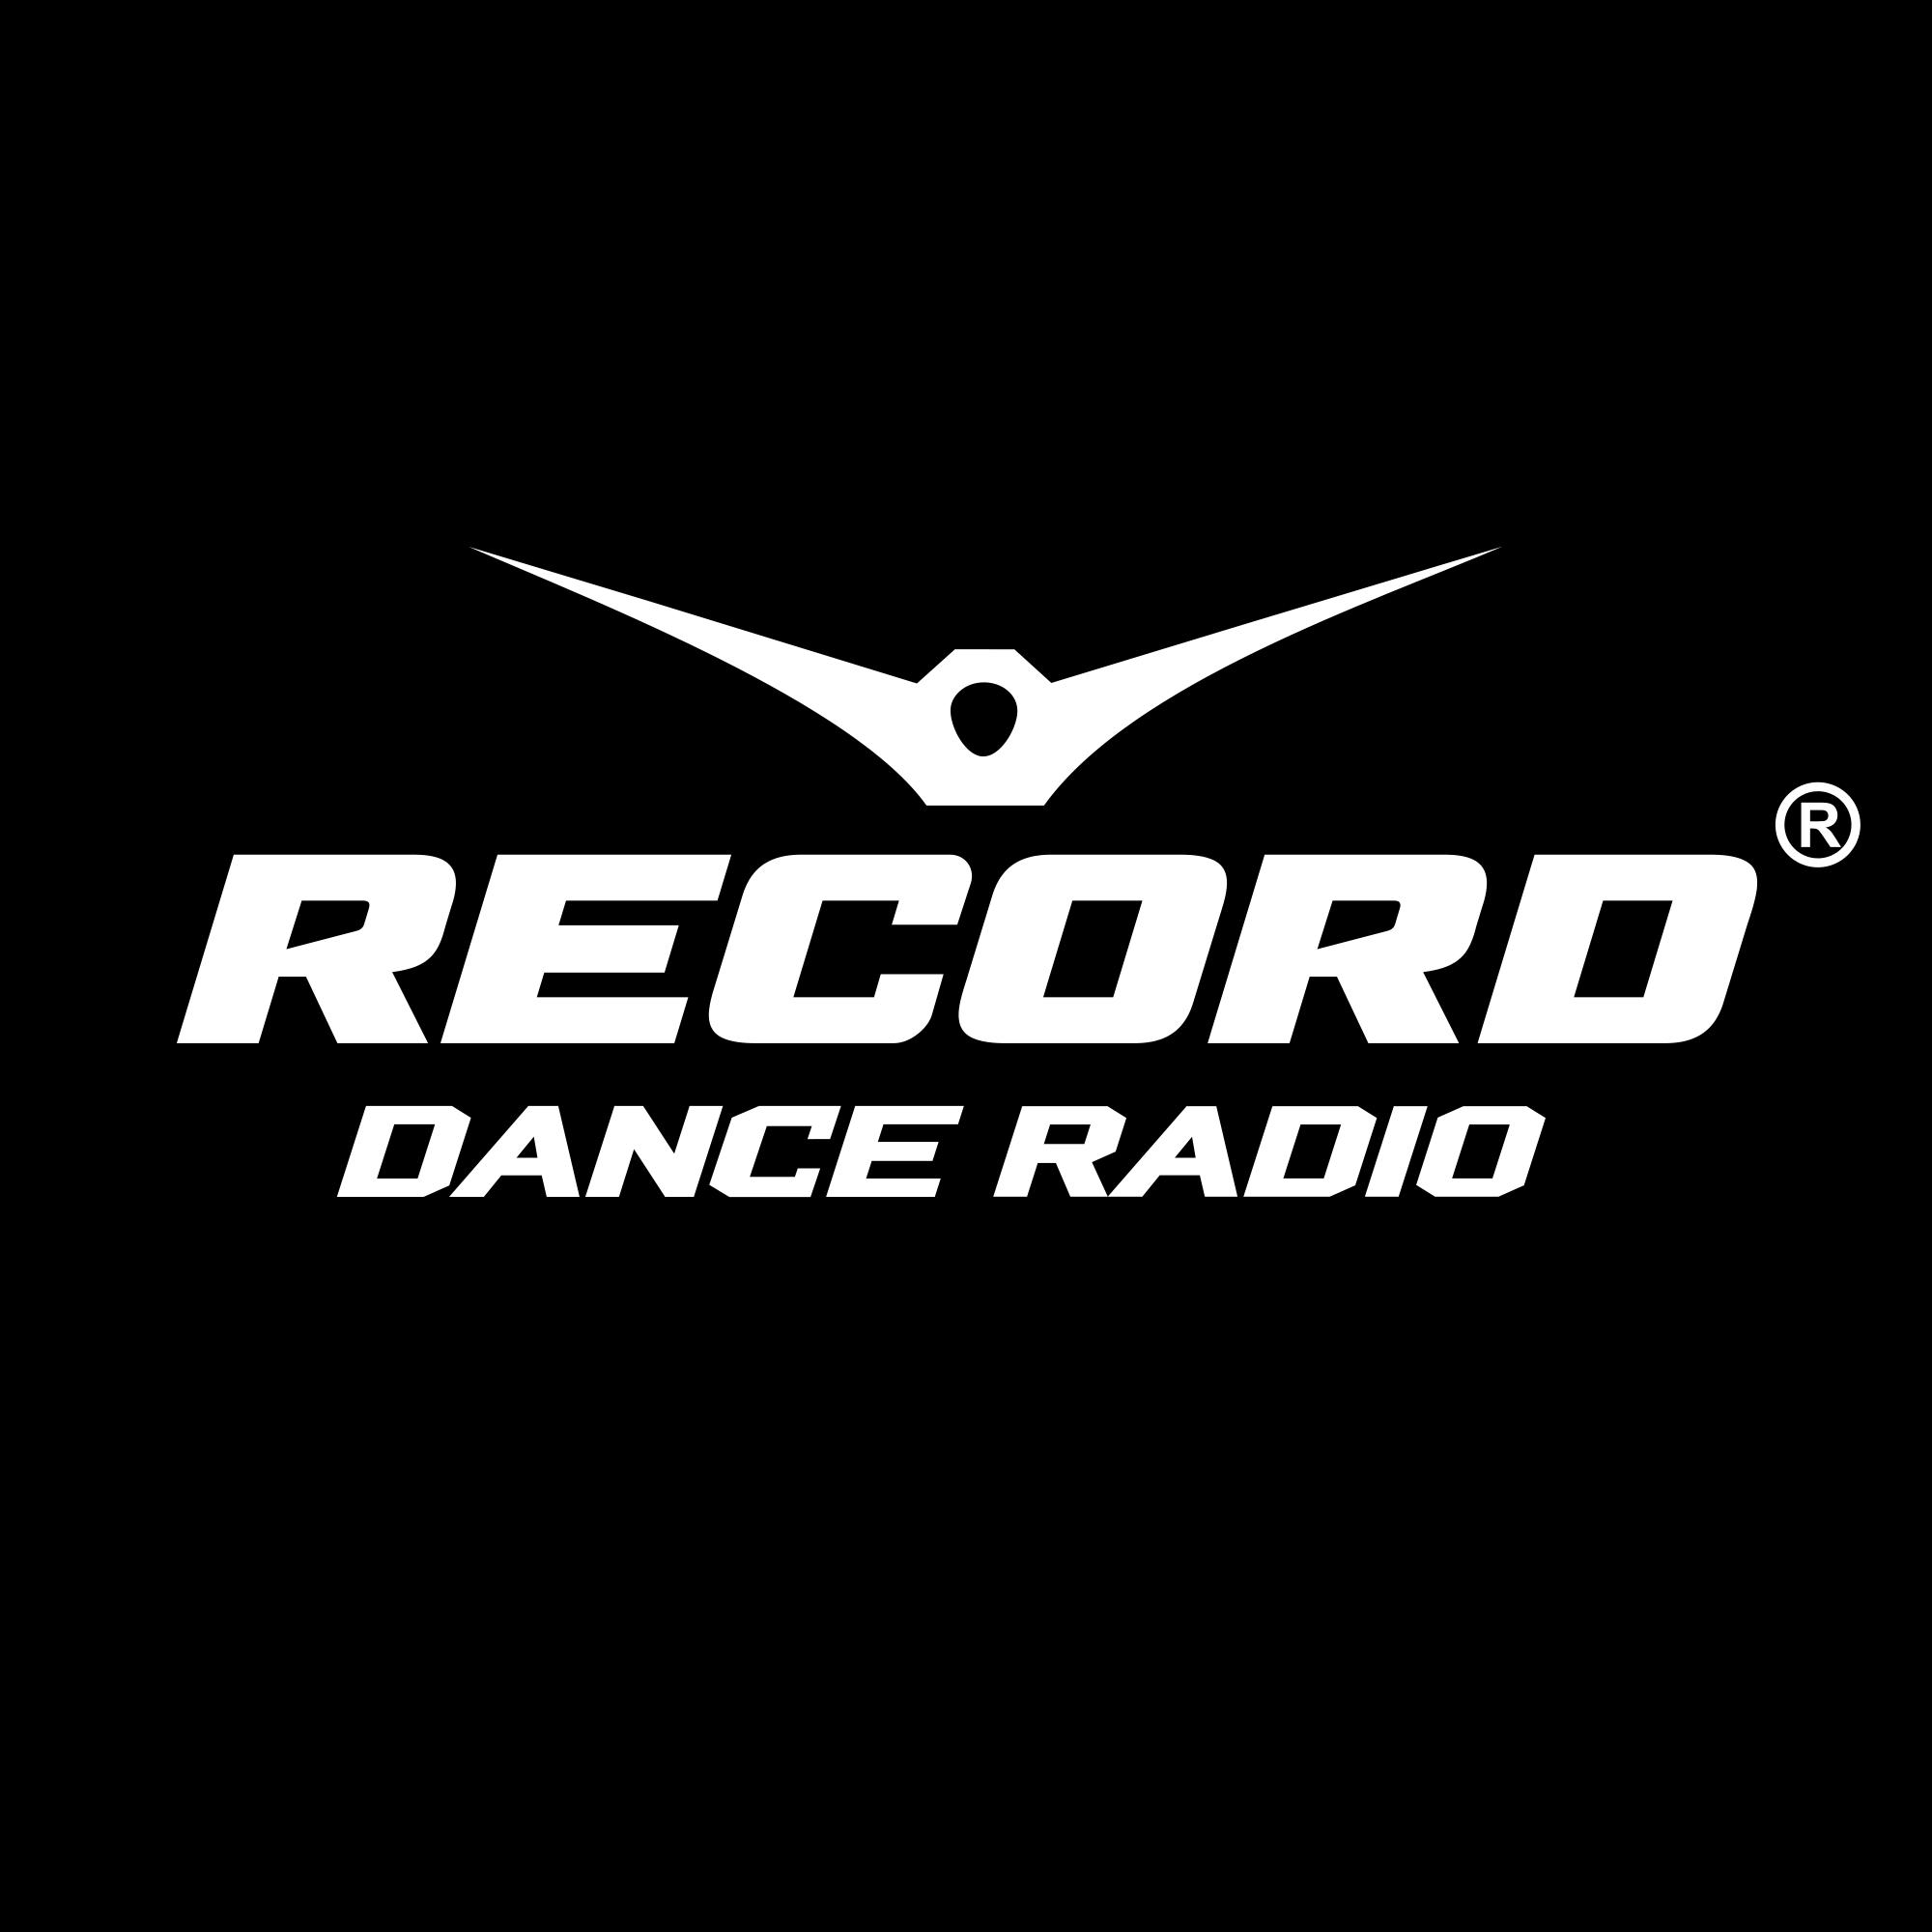 прическа радио рекорд картинки на телефон качестве